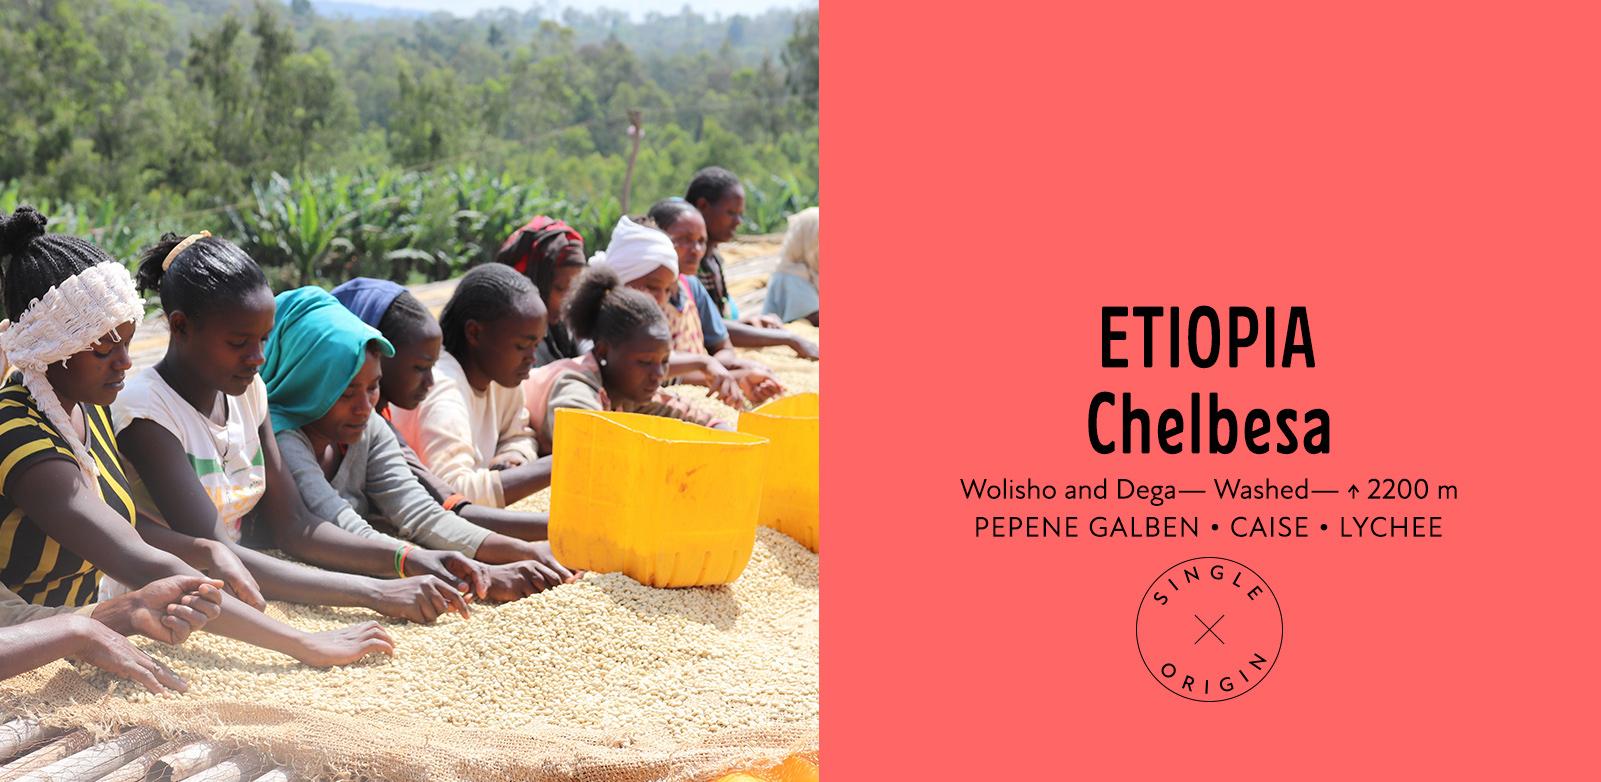 Ethiopia Chelbesa